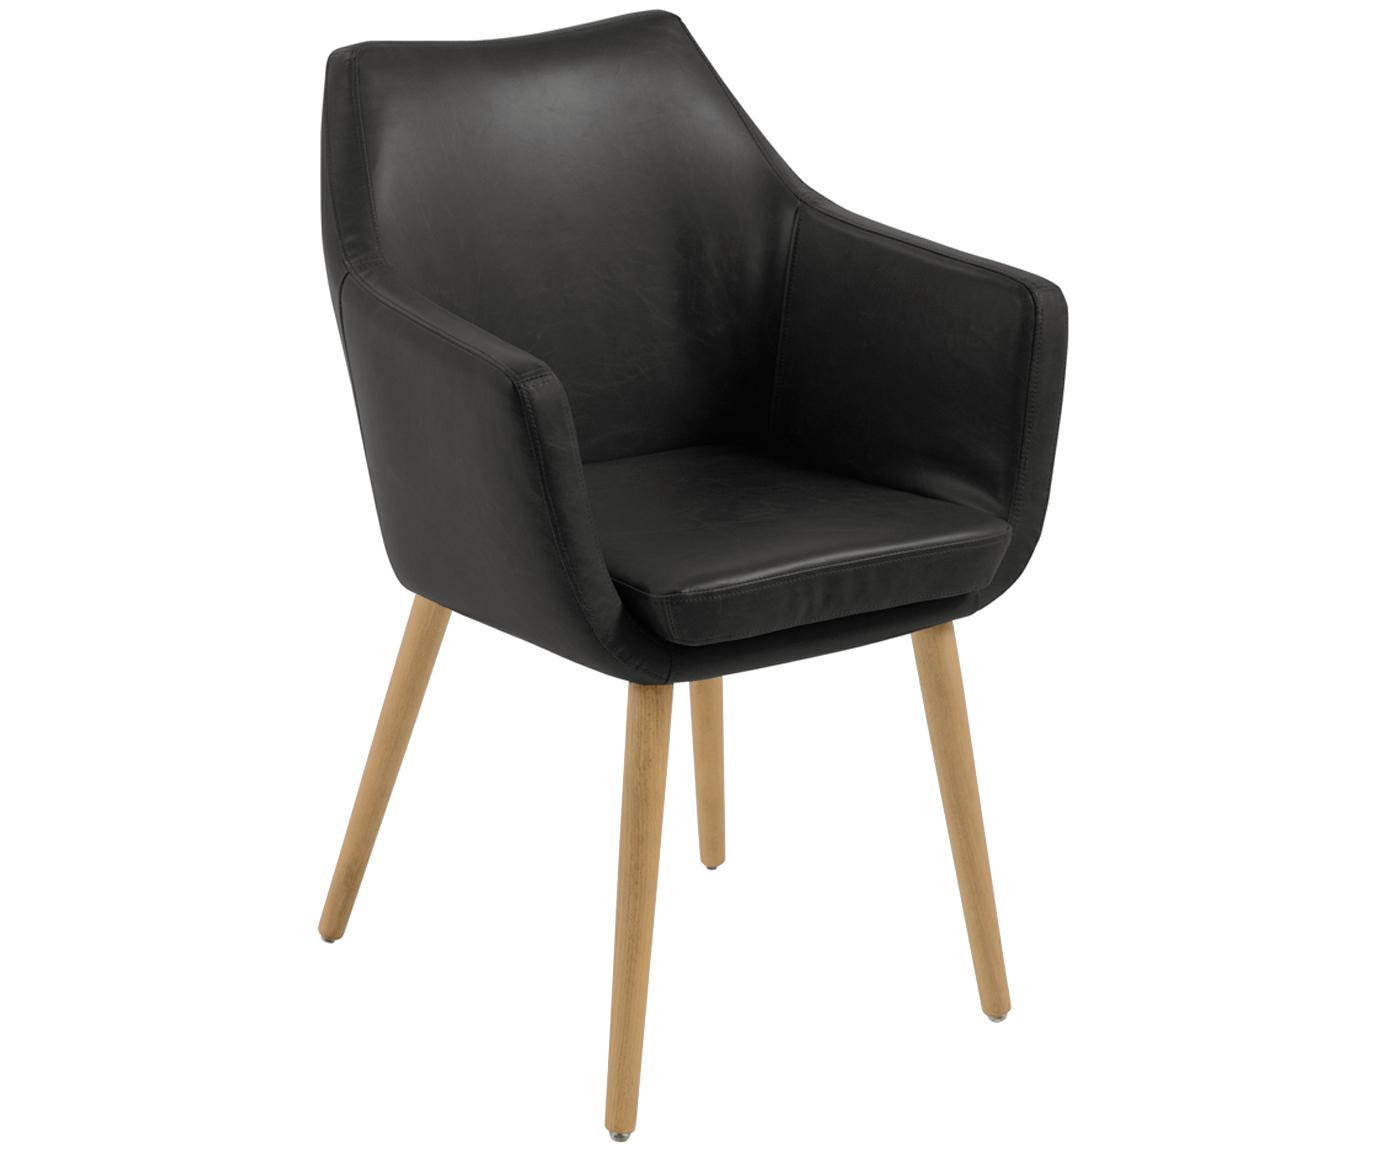 Kunstleren armstoel Nora, Bekleding: imitatieleer (polyurethaa, Poten: eikenhout, Bekleding: zwart. Frame: eikenhoutkleurig, B 56 cm